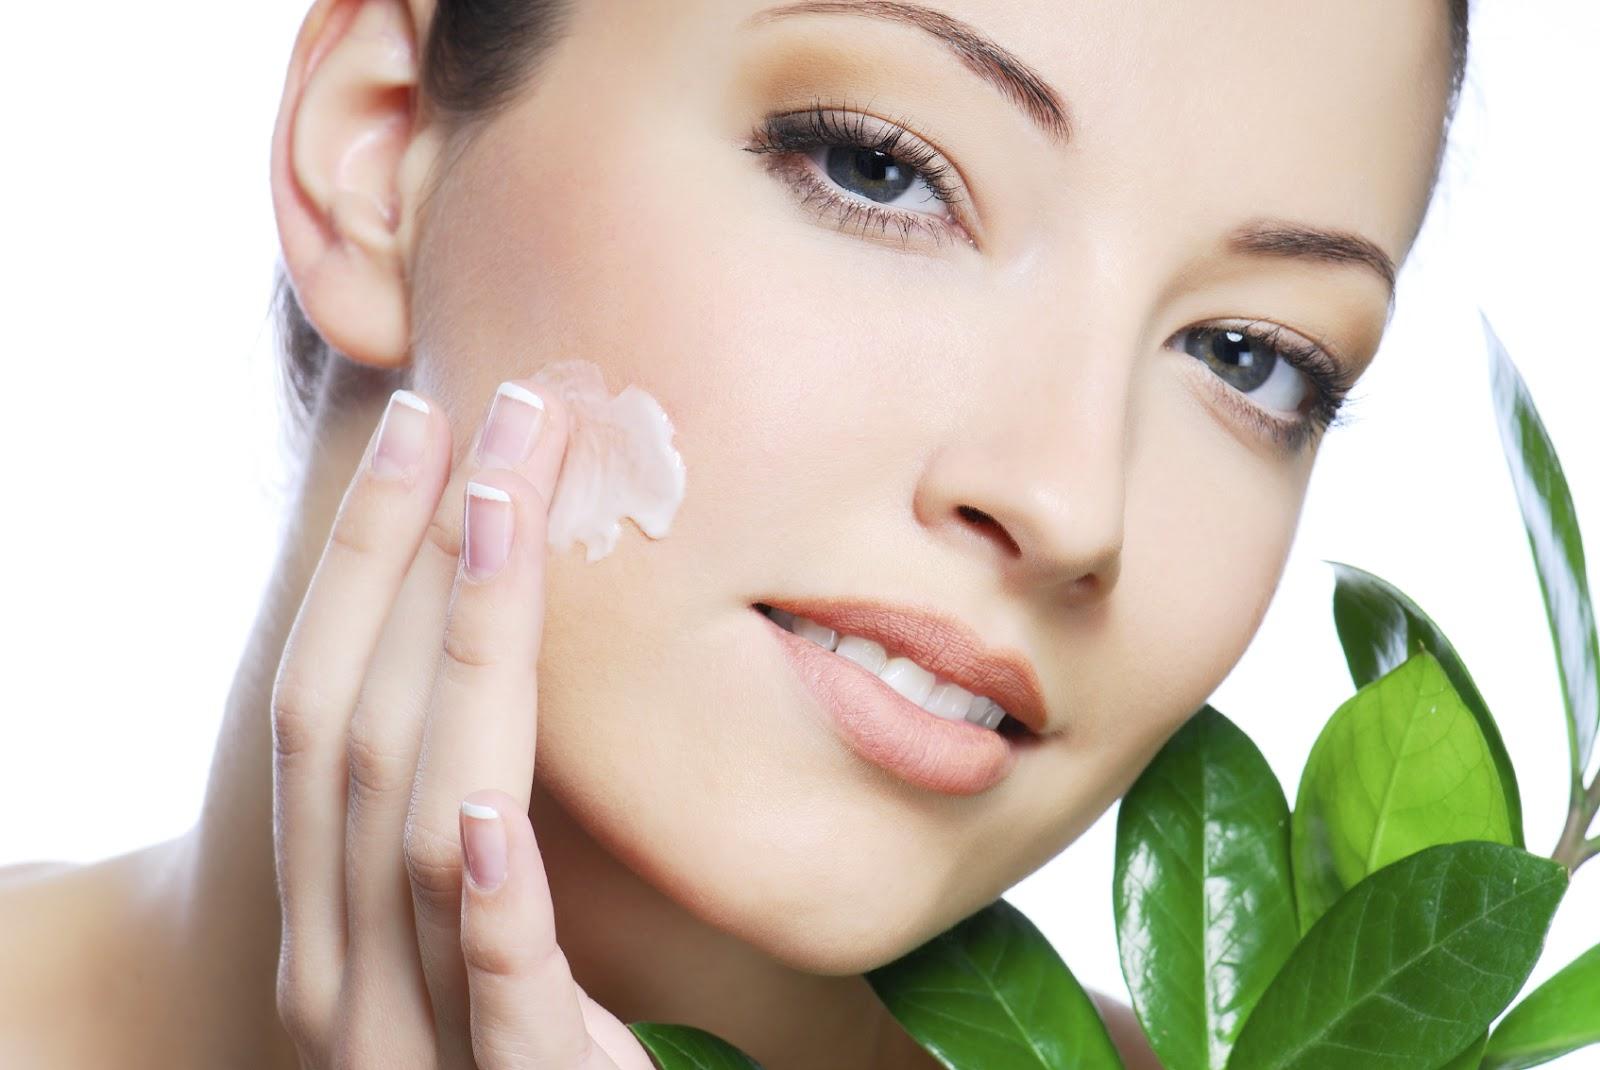 Easy tips for acne!